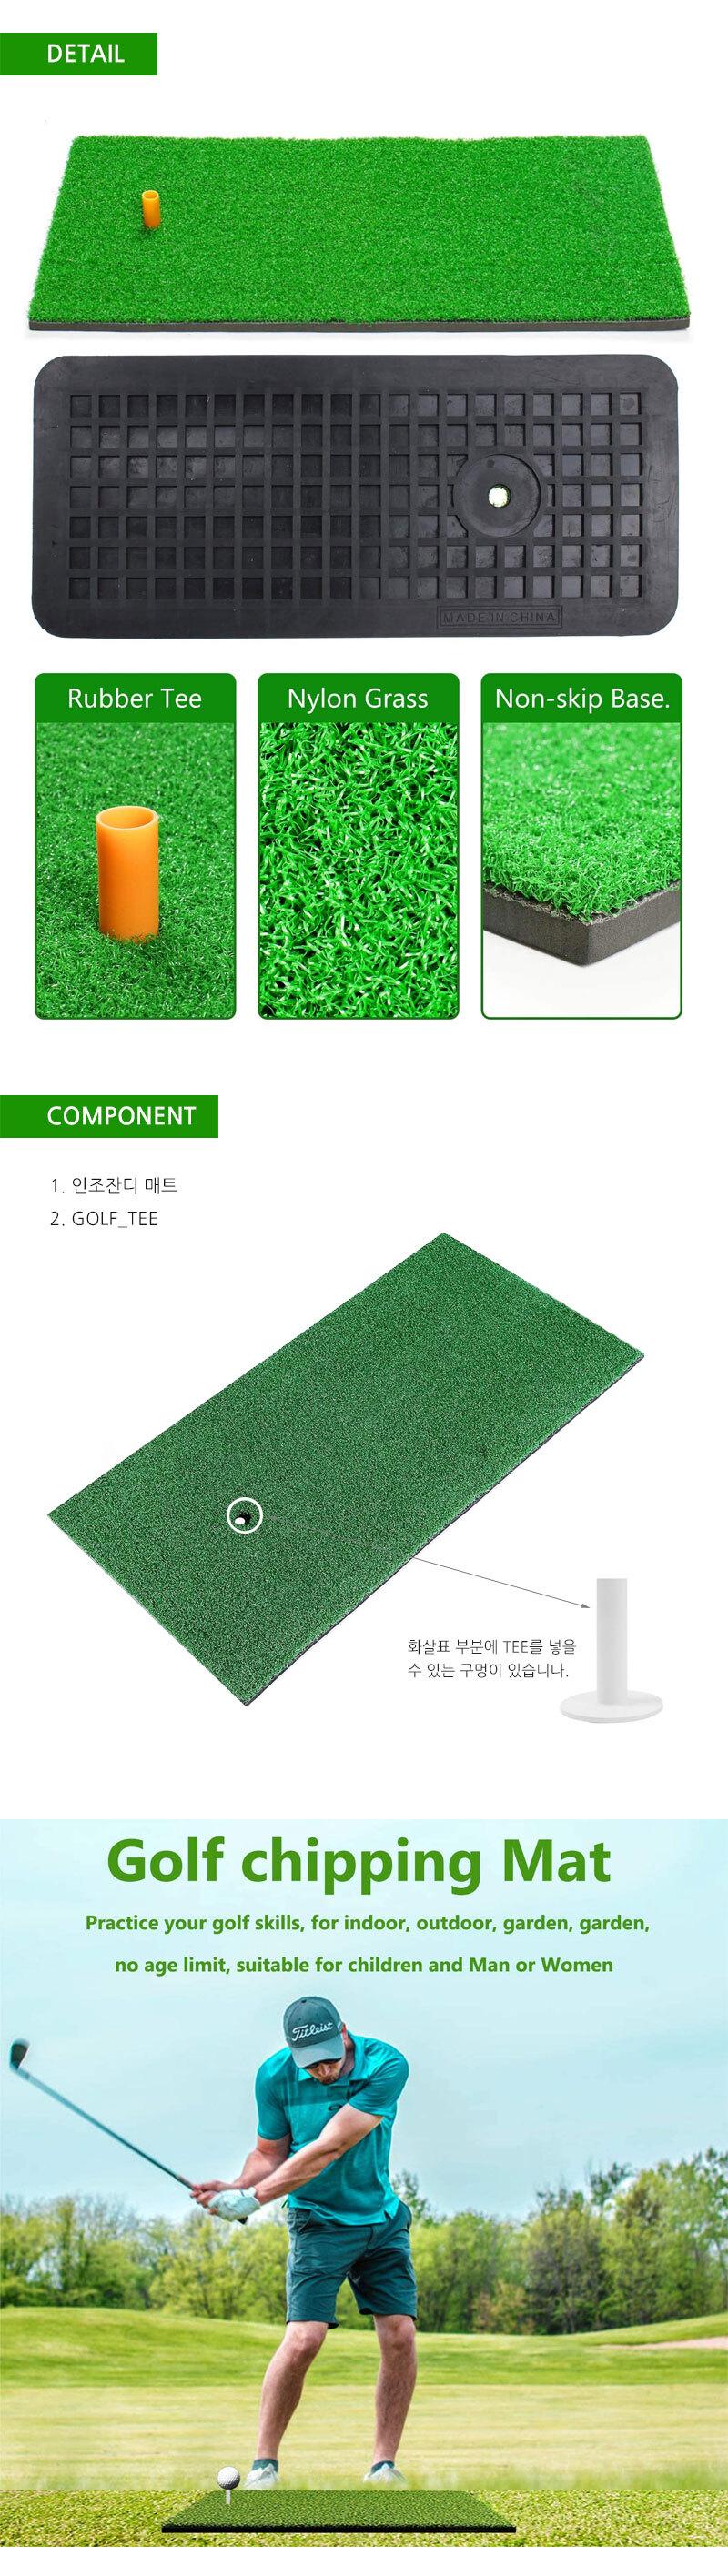 N4U(엔포유) 골프매트 N4U-GM001 스윙 잔디매트 - 엔포유, 30,000원, 골프, 연습용품